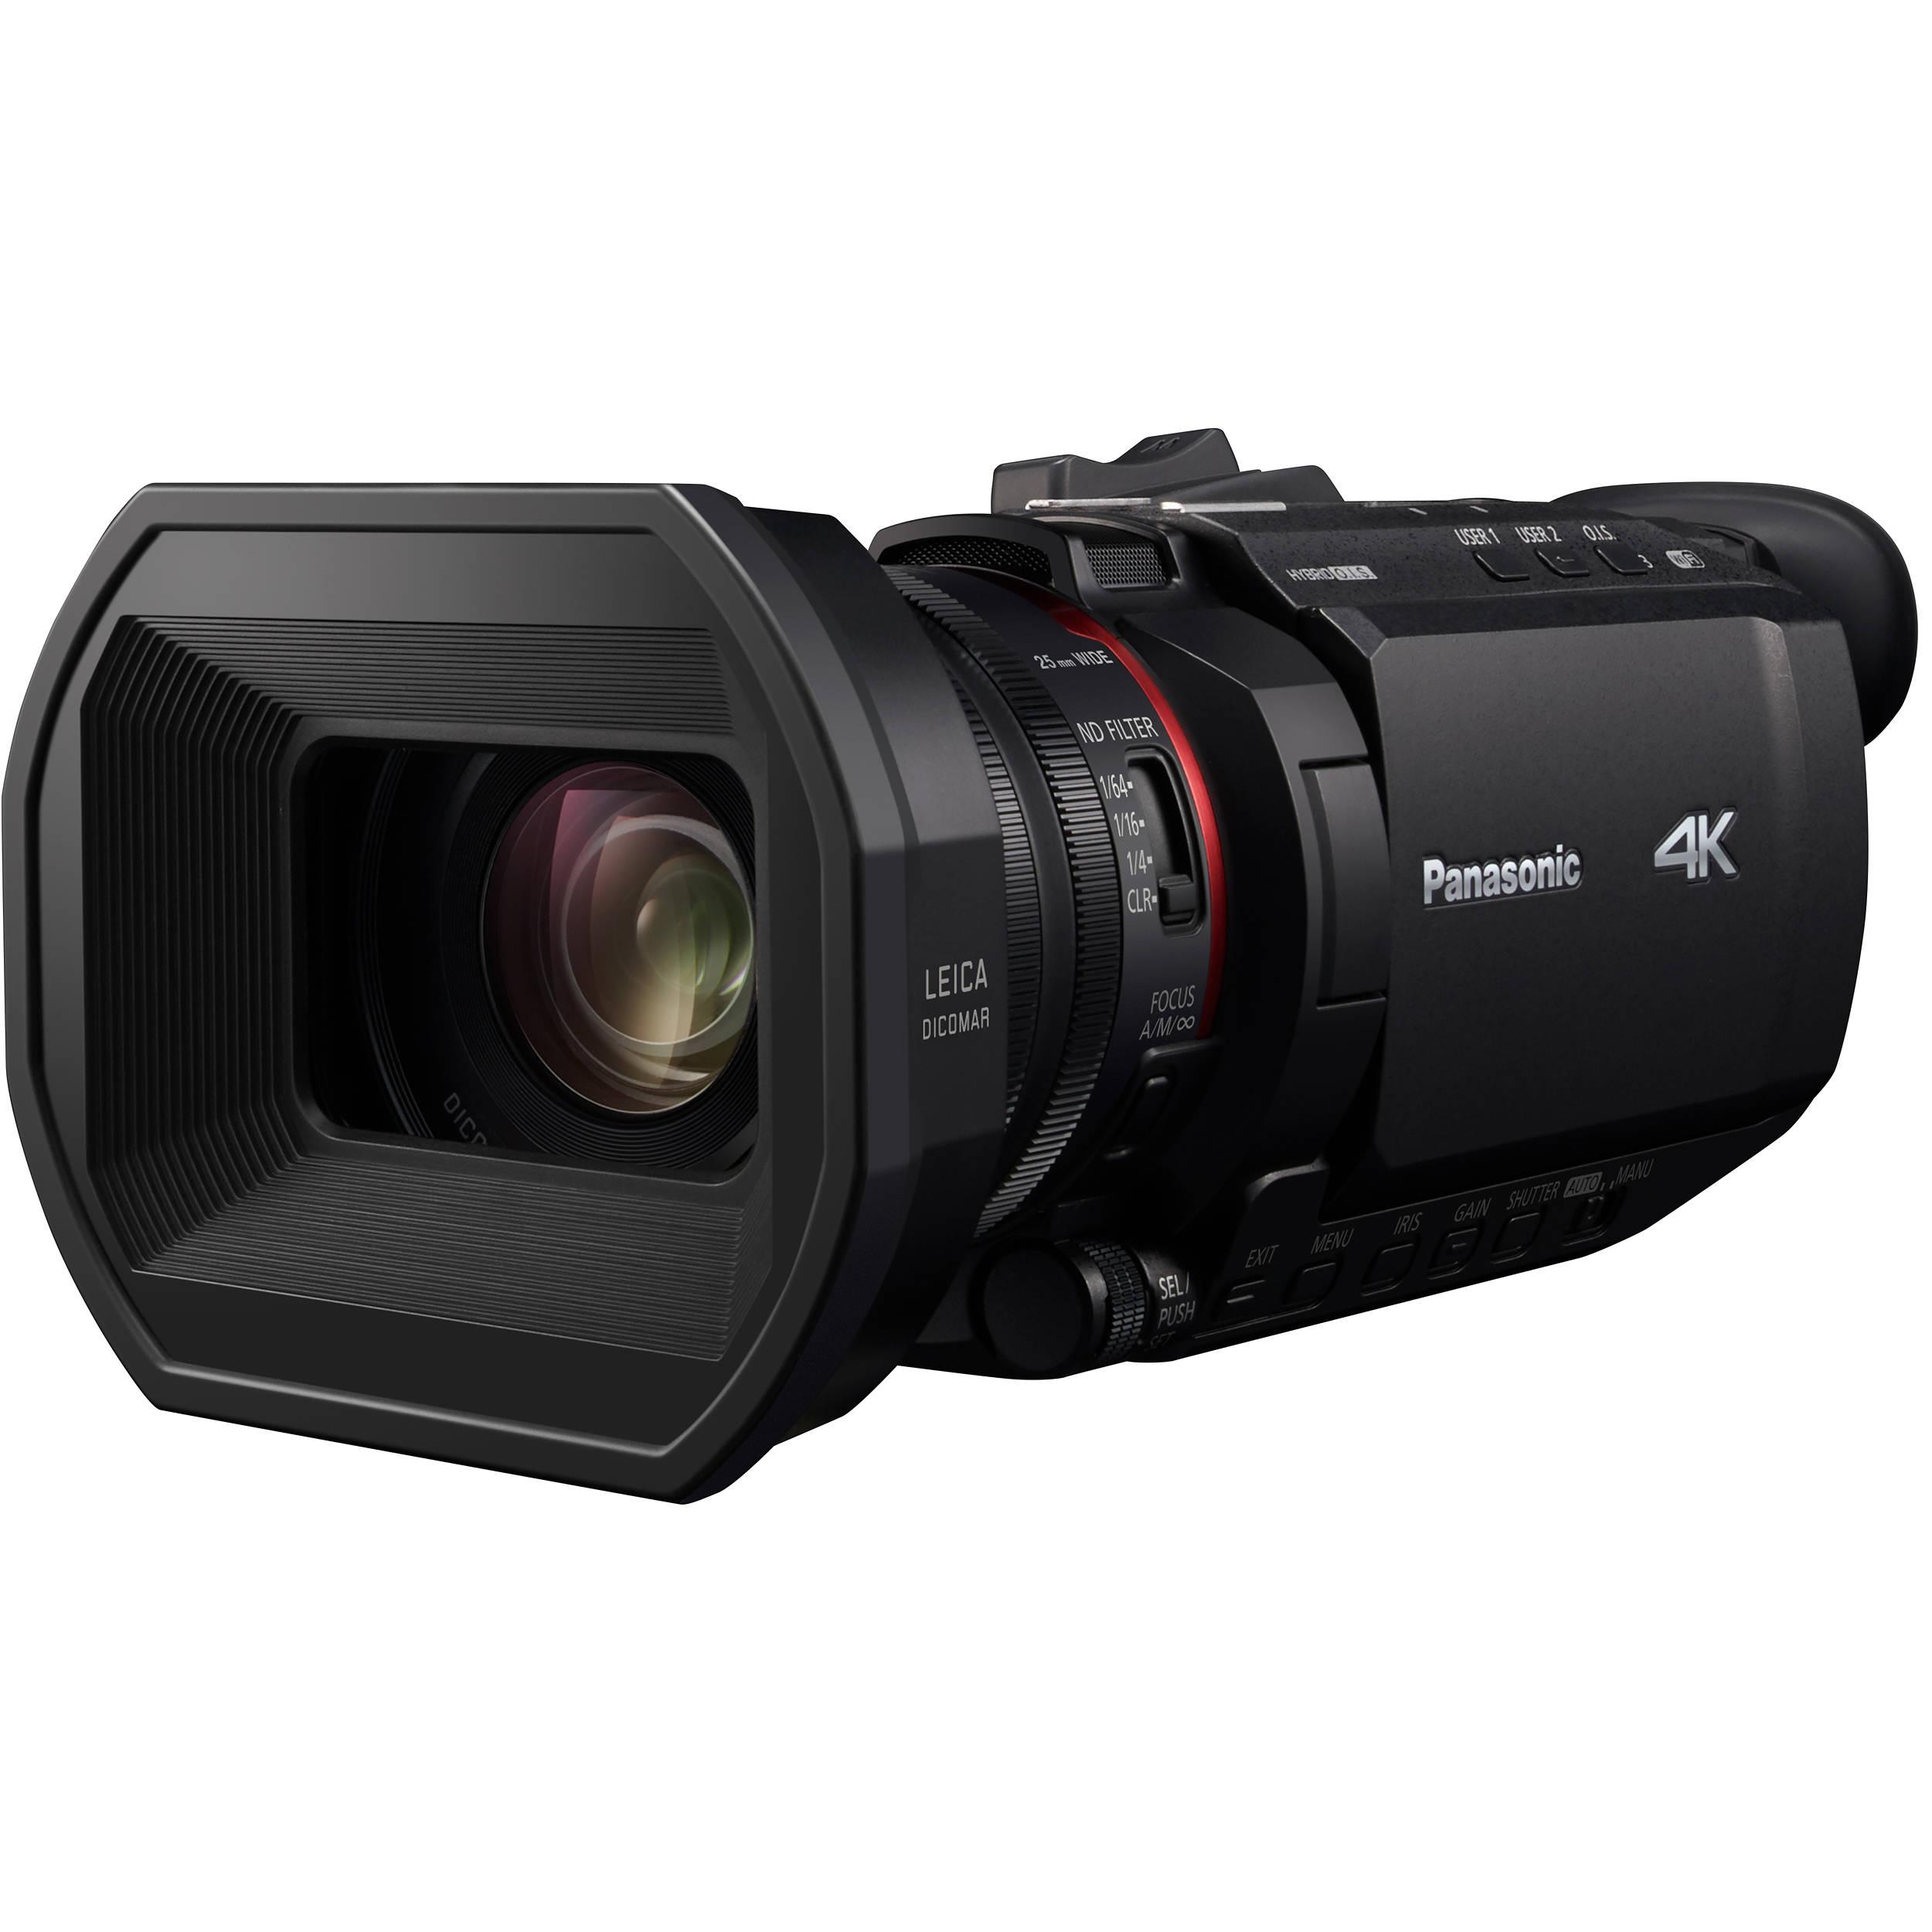 Panasonic HC-X1500 UHD 4K HDMI Pro Camcorder with 24x HC-X1500